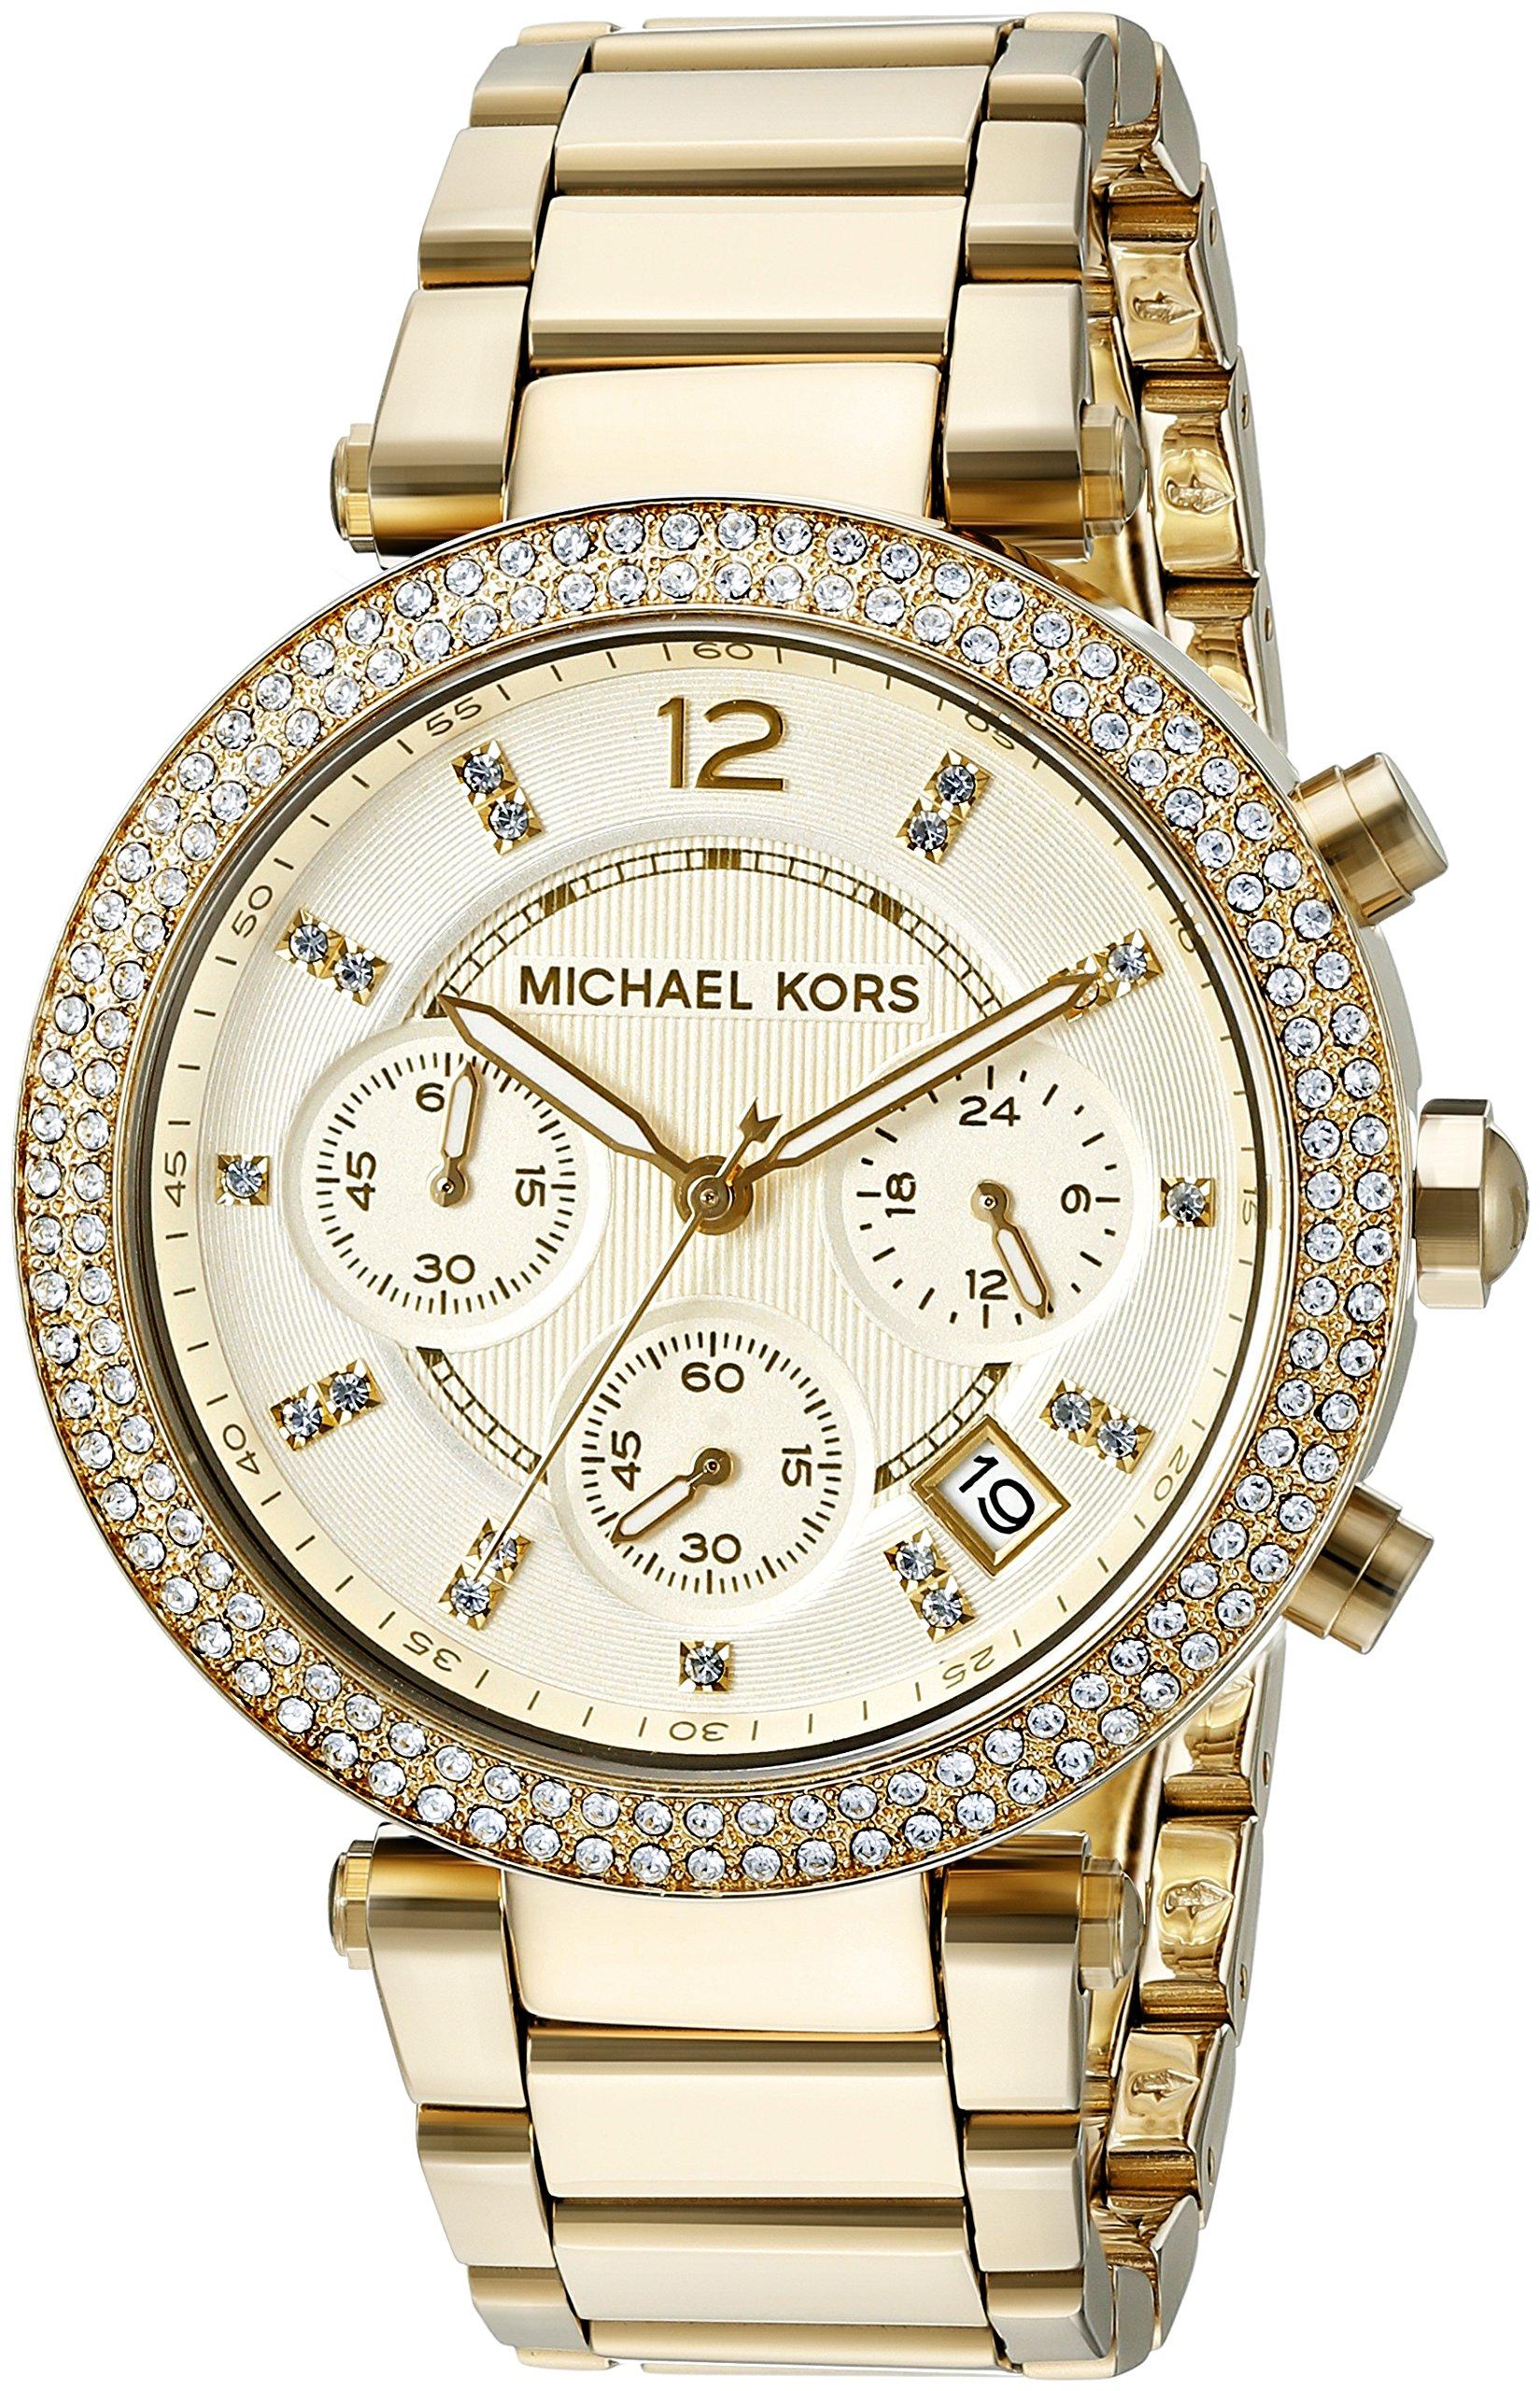 Đồng hồ Michael Kors Watches Parker Watch chính hãng Michael Kors